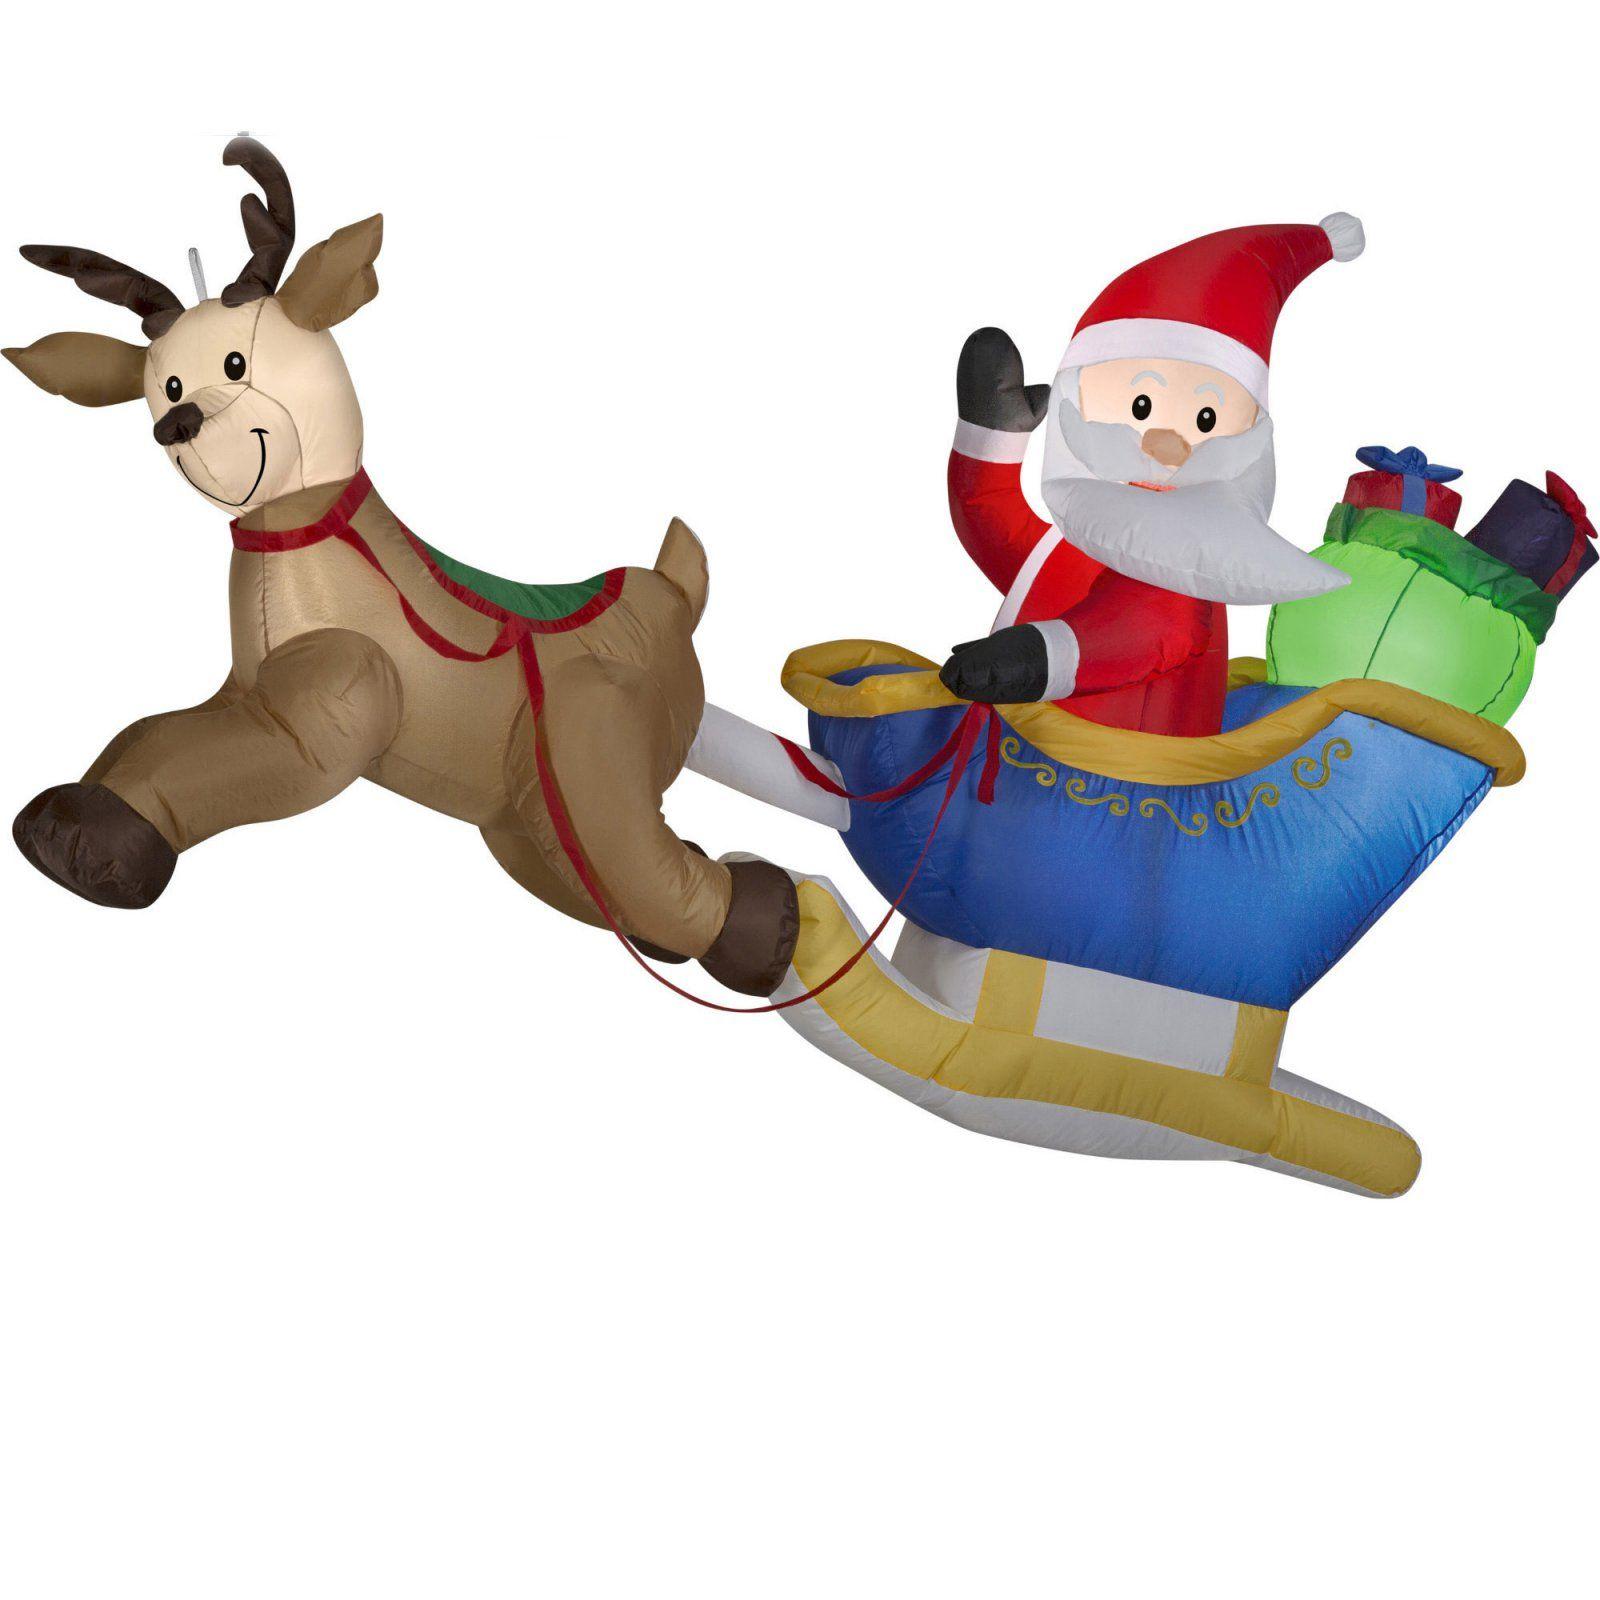 Gemmy Flying Santa And Reindeer Outdoor Inflatable Yard Decor Santa And Reindeer Christmas Inflatables Reindeer Lights